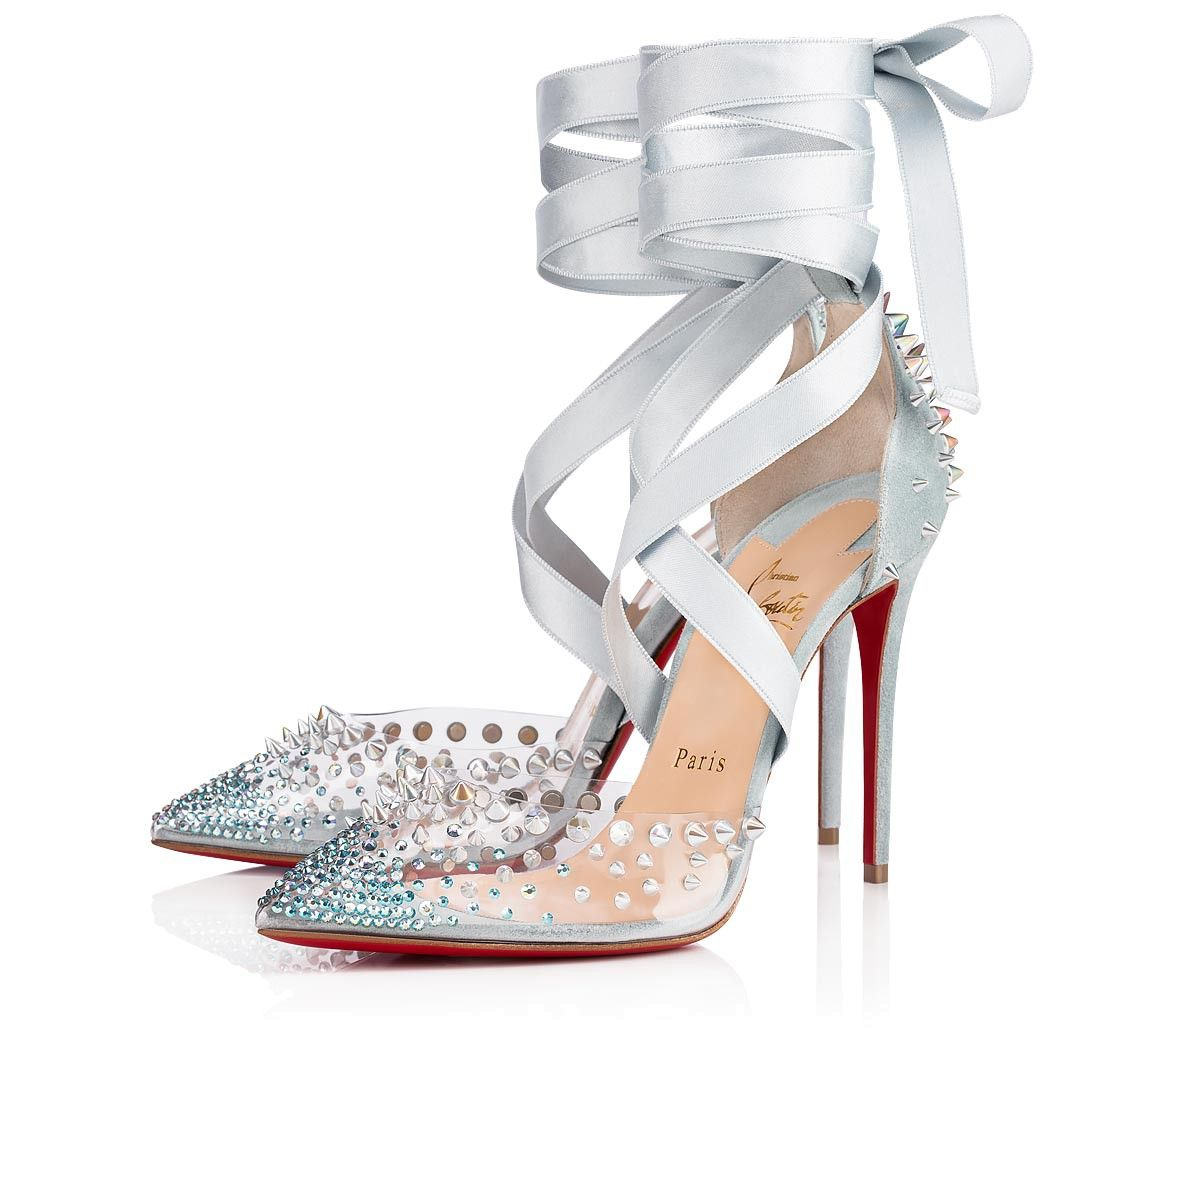 8350dc3f7860d Mechante Reine 100 Version Nuage Strass - Women Shoes - Christian Louboutin